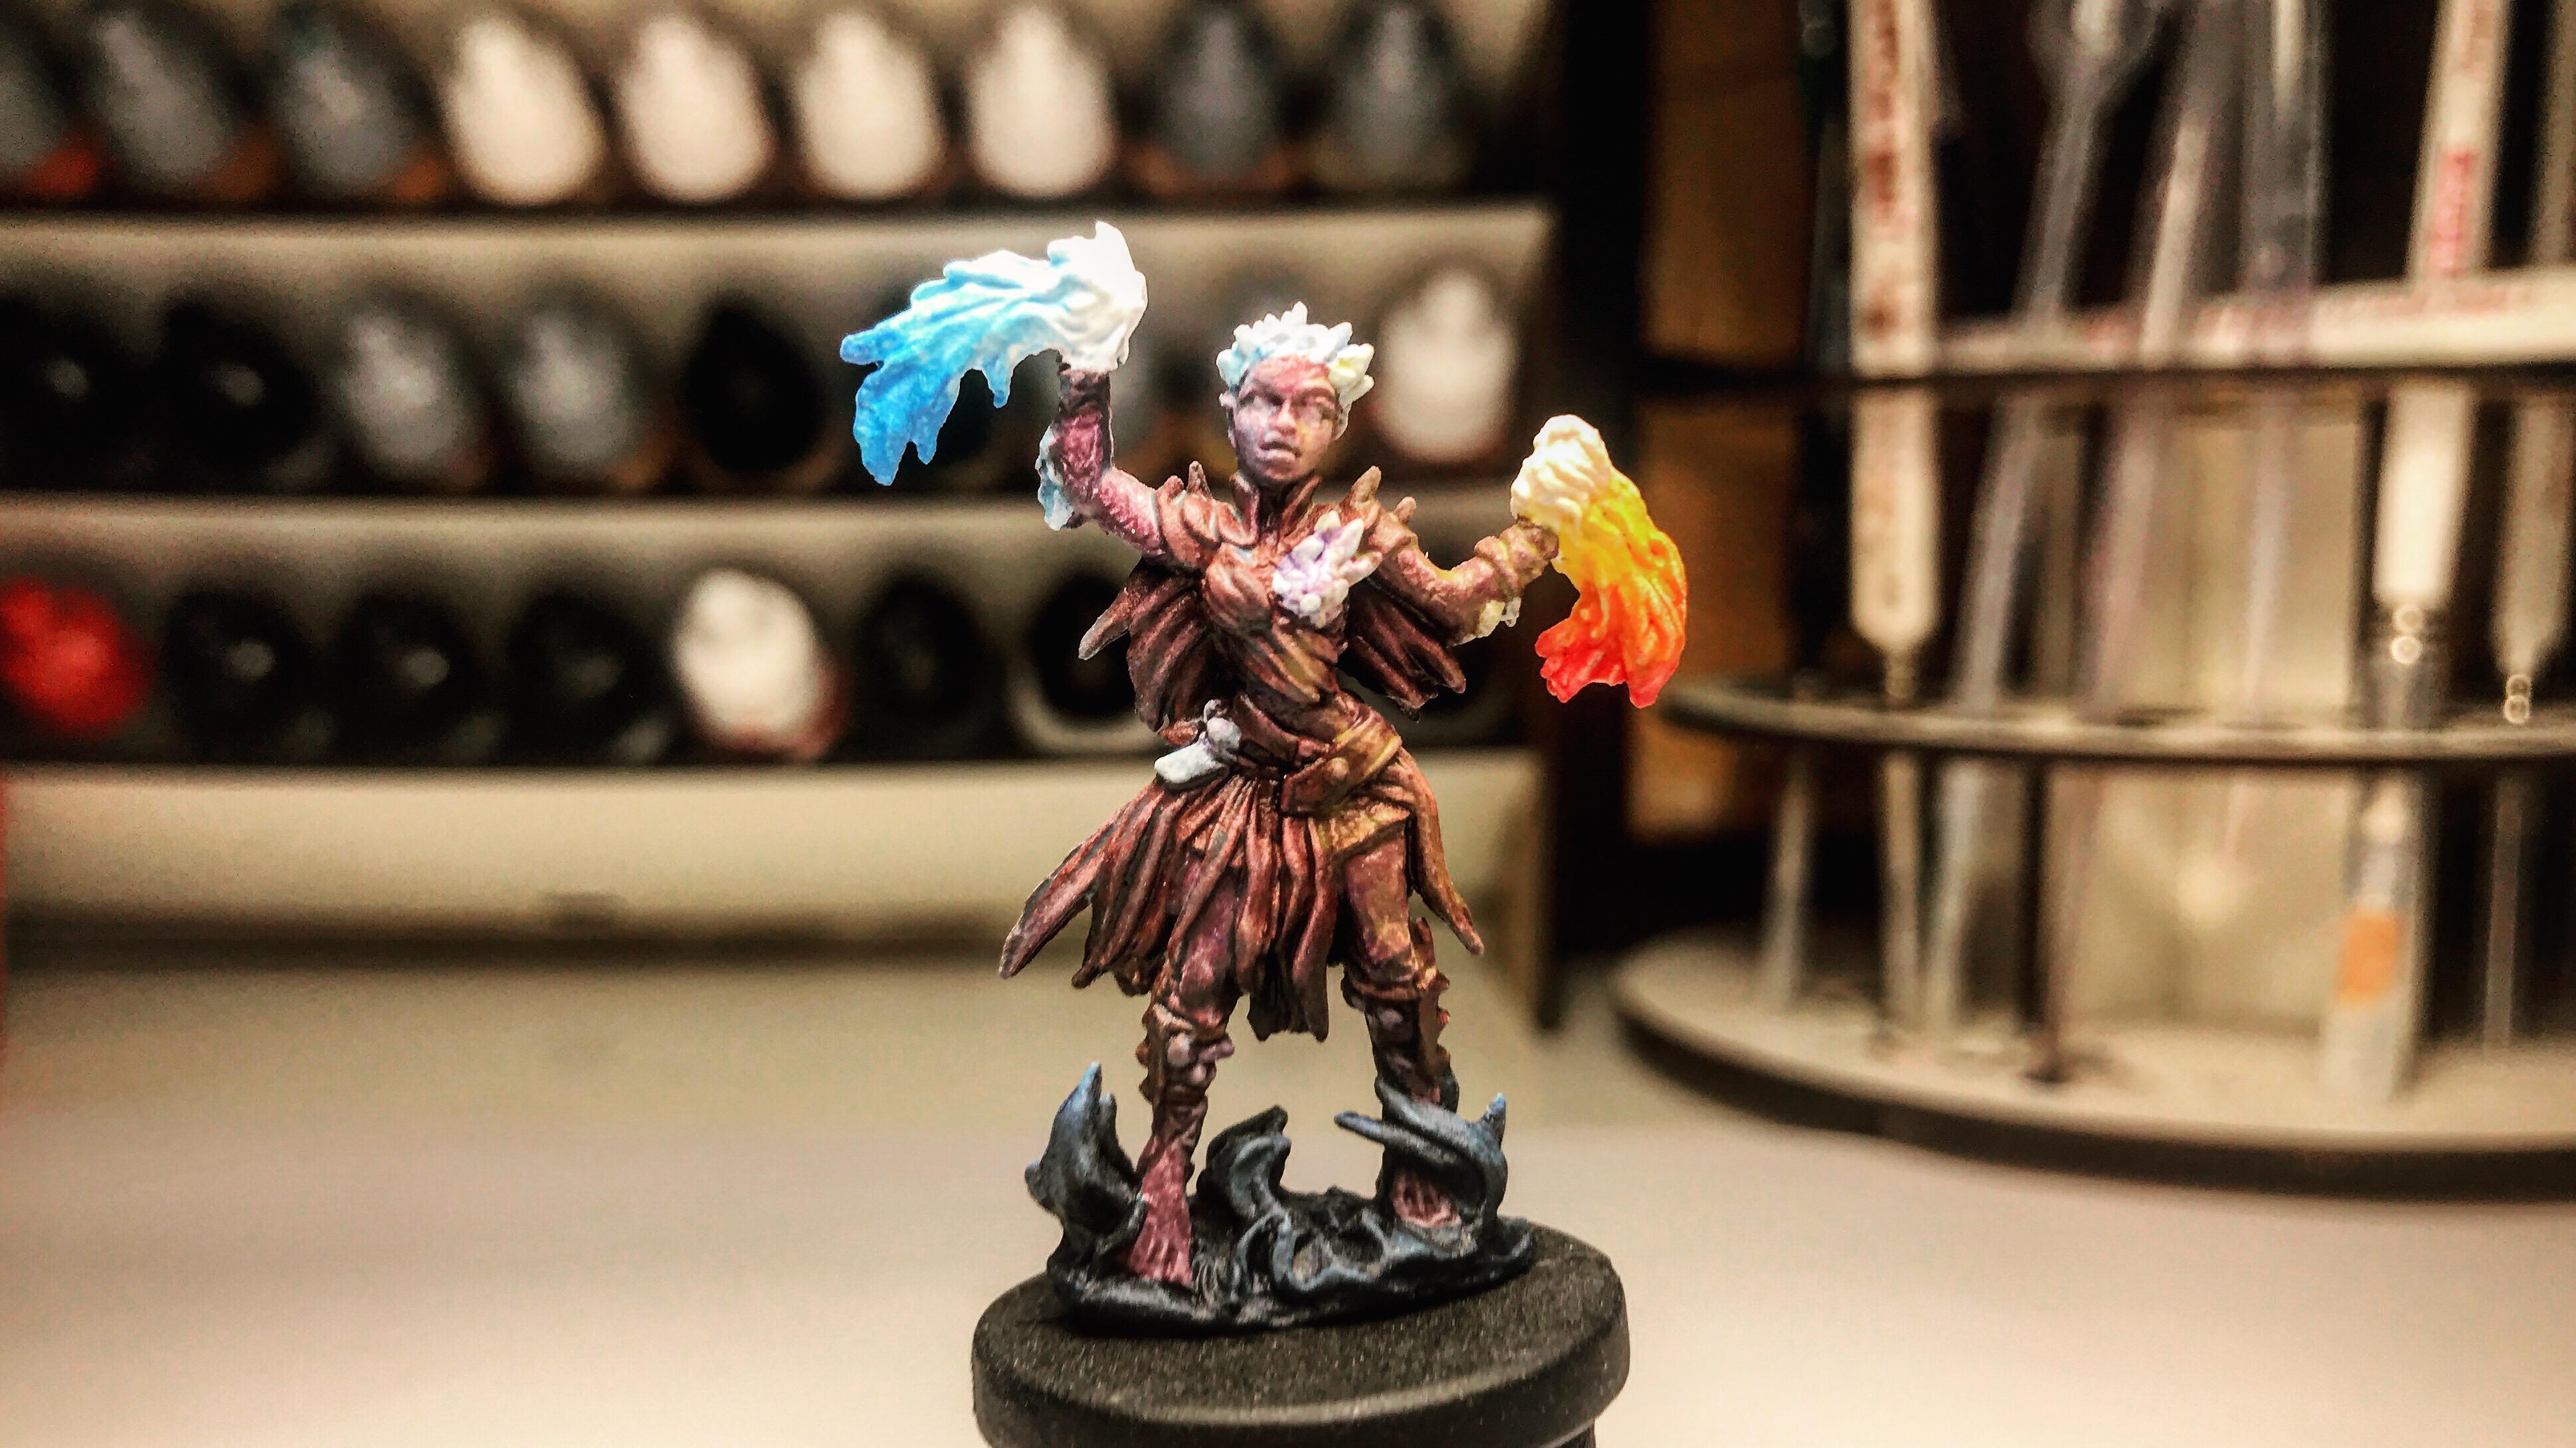 Spellweaver Gloomhaven painted